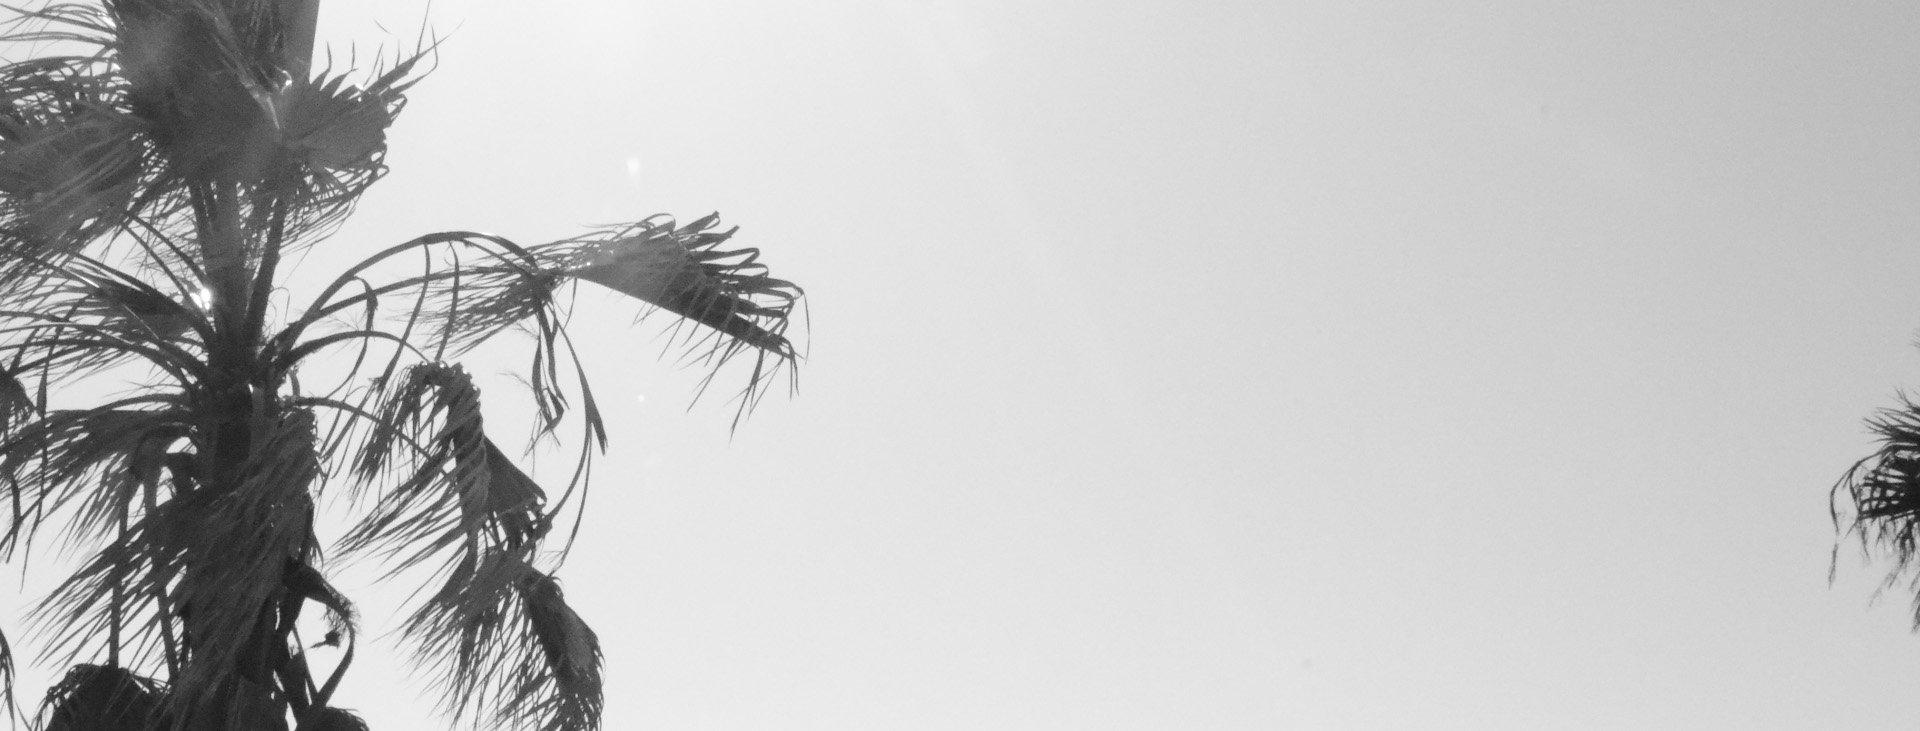 Luna Sonego Design_palms.jpg